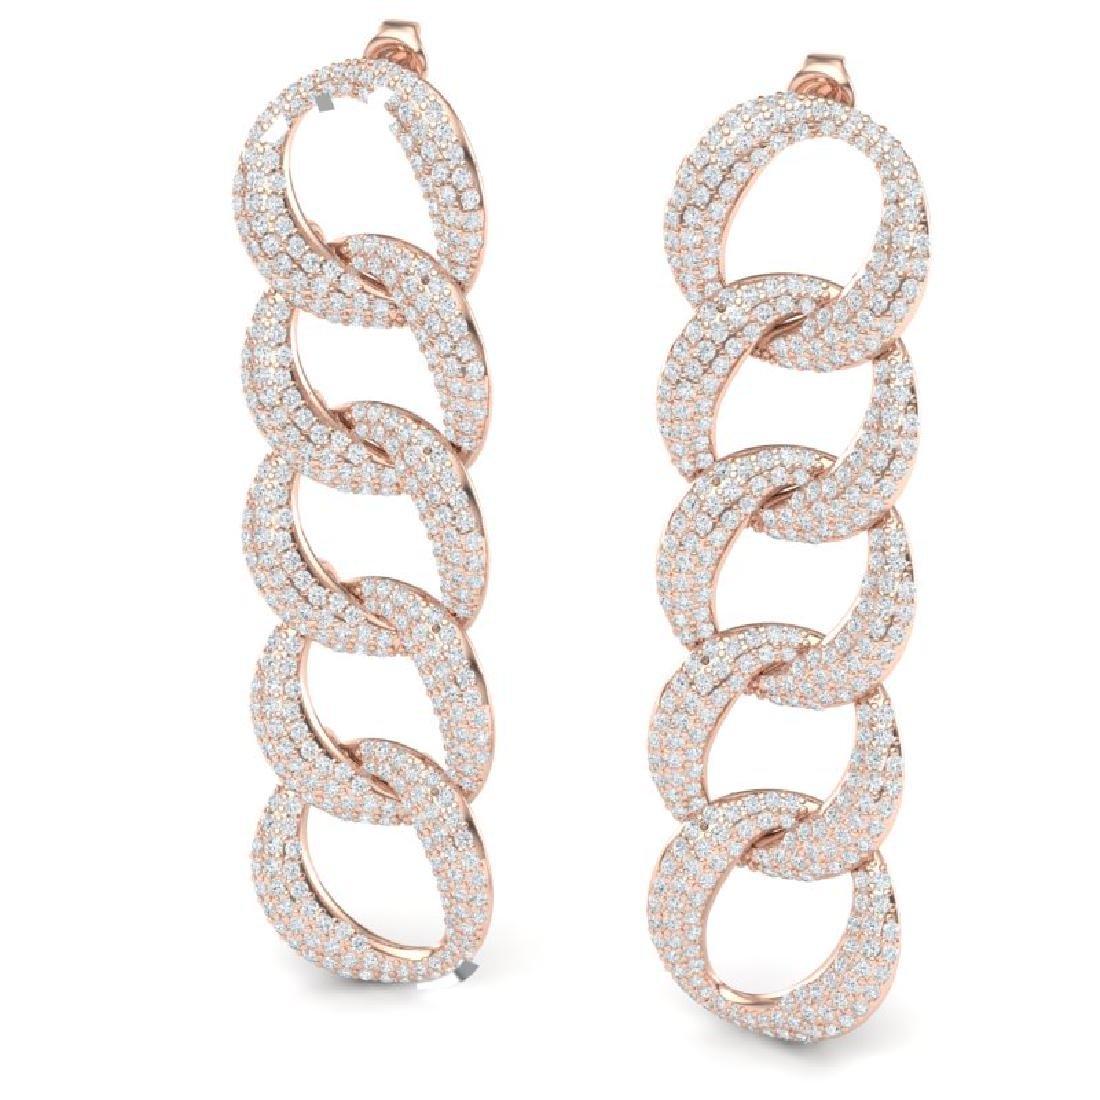 5 CTW Certified VS/SI Diamond Earrings 18K Rose Gold - 2